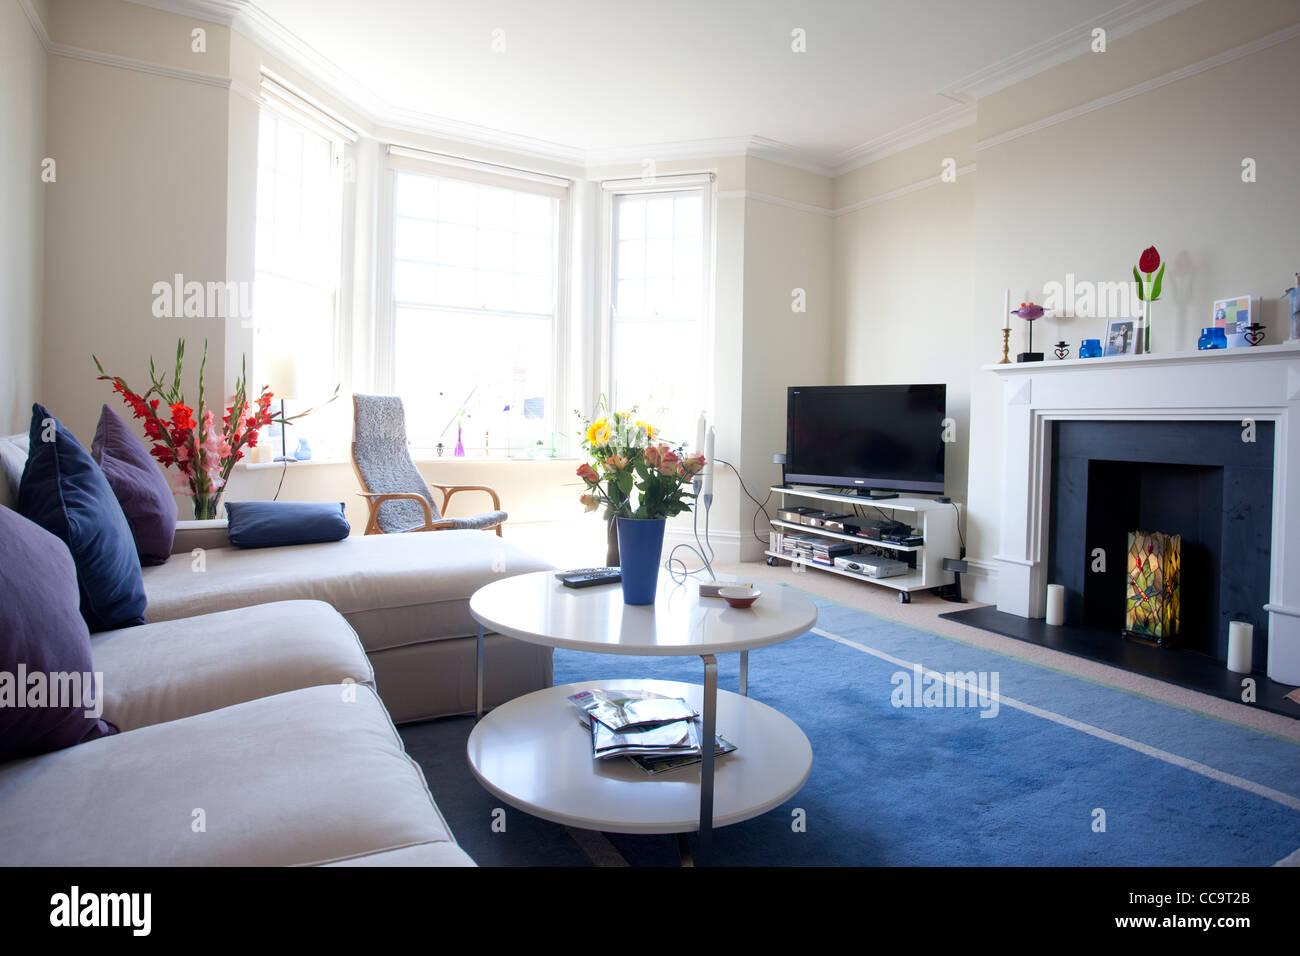 Apartamento salón georgiano, Hammersmith, Londres, Reino Unido Imagen De Stock